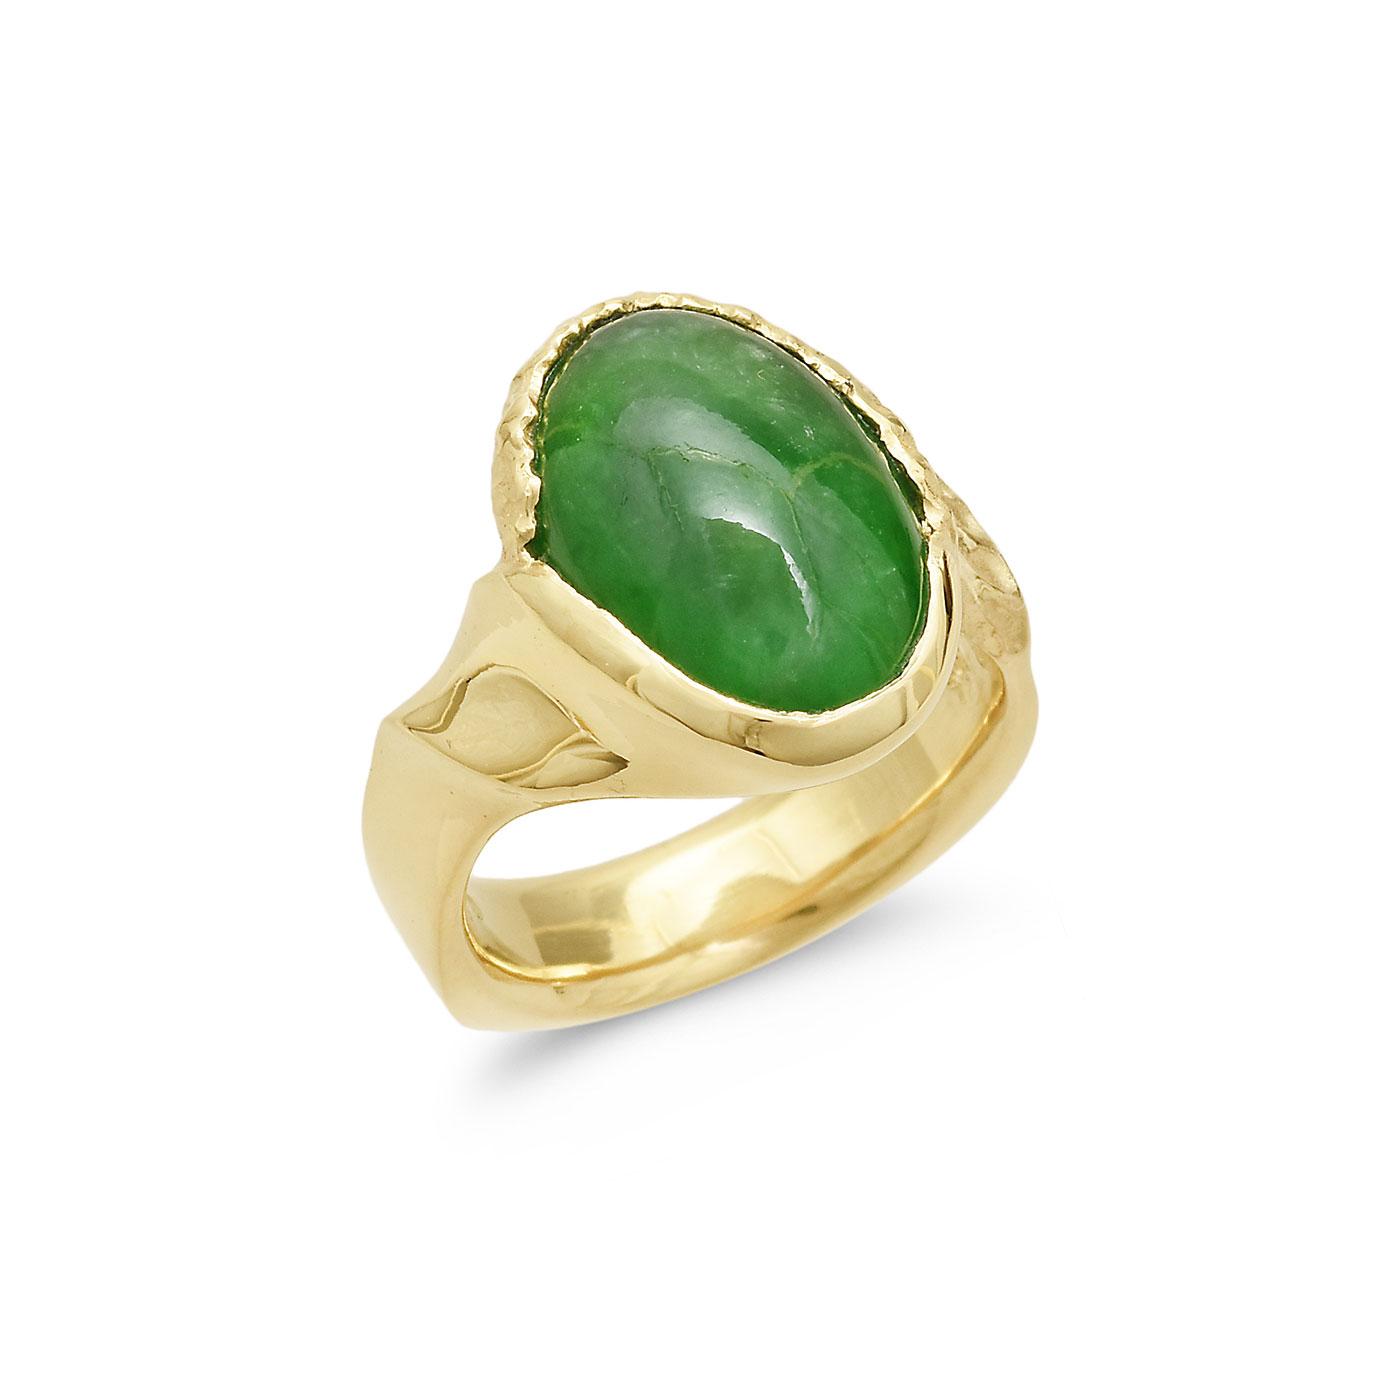 C7572 Oval Green Jadeite Ring